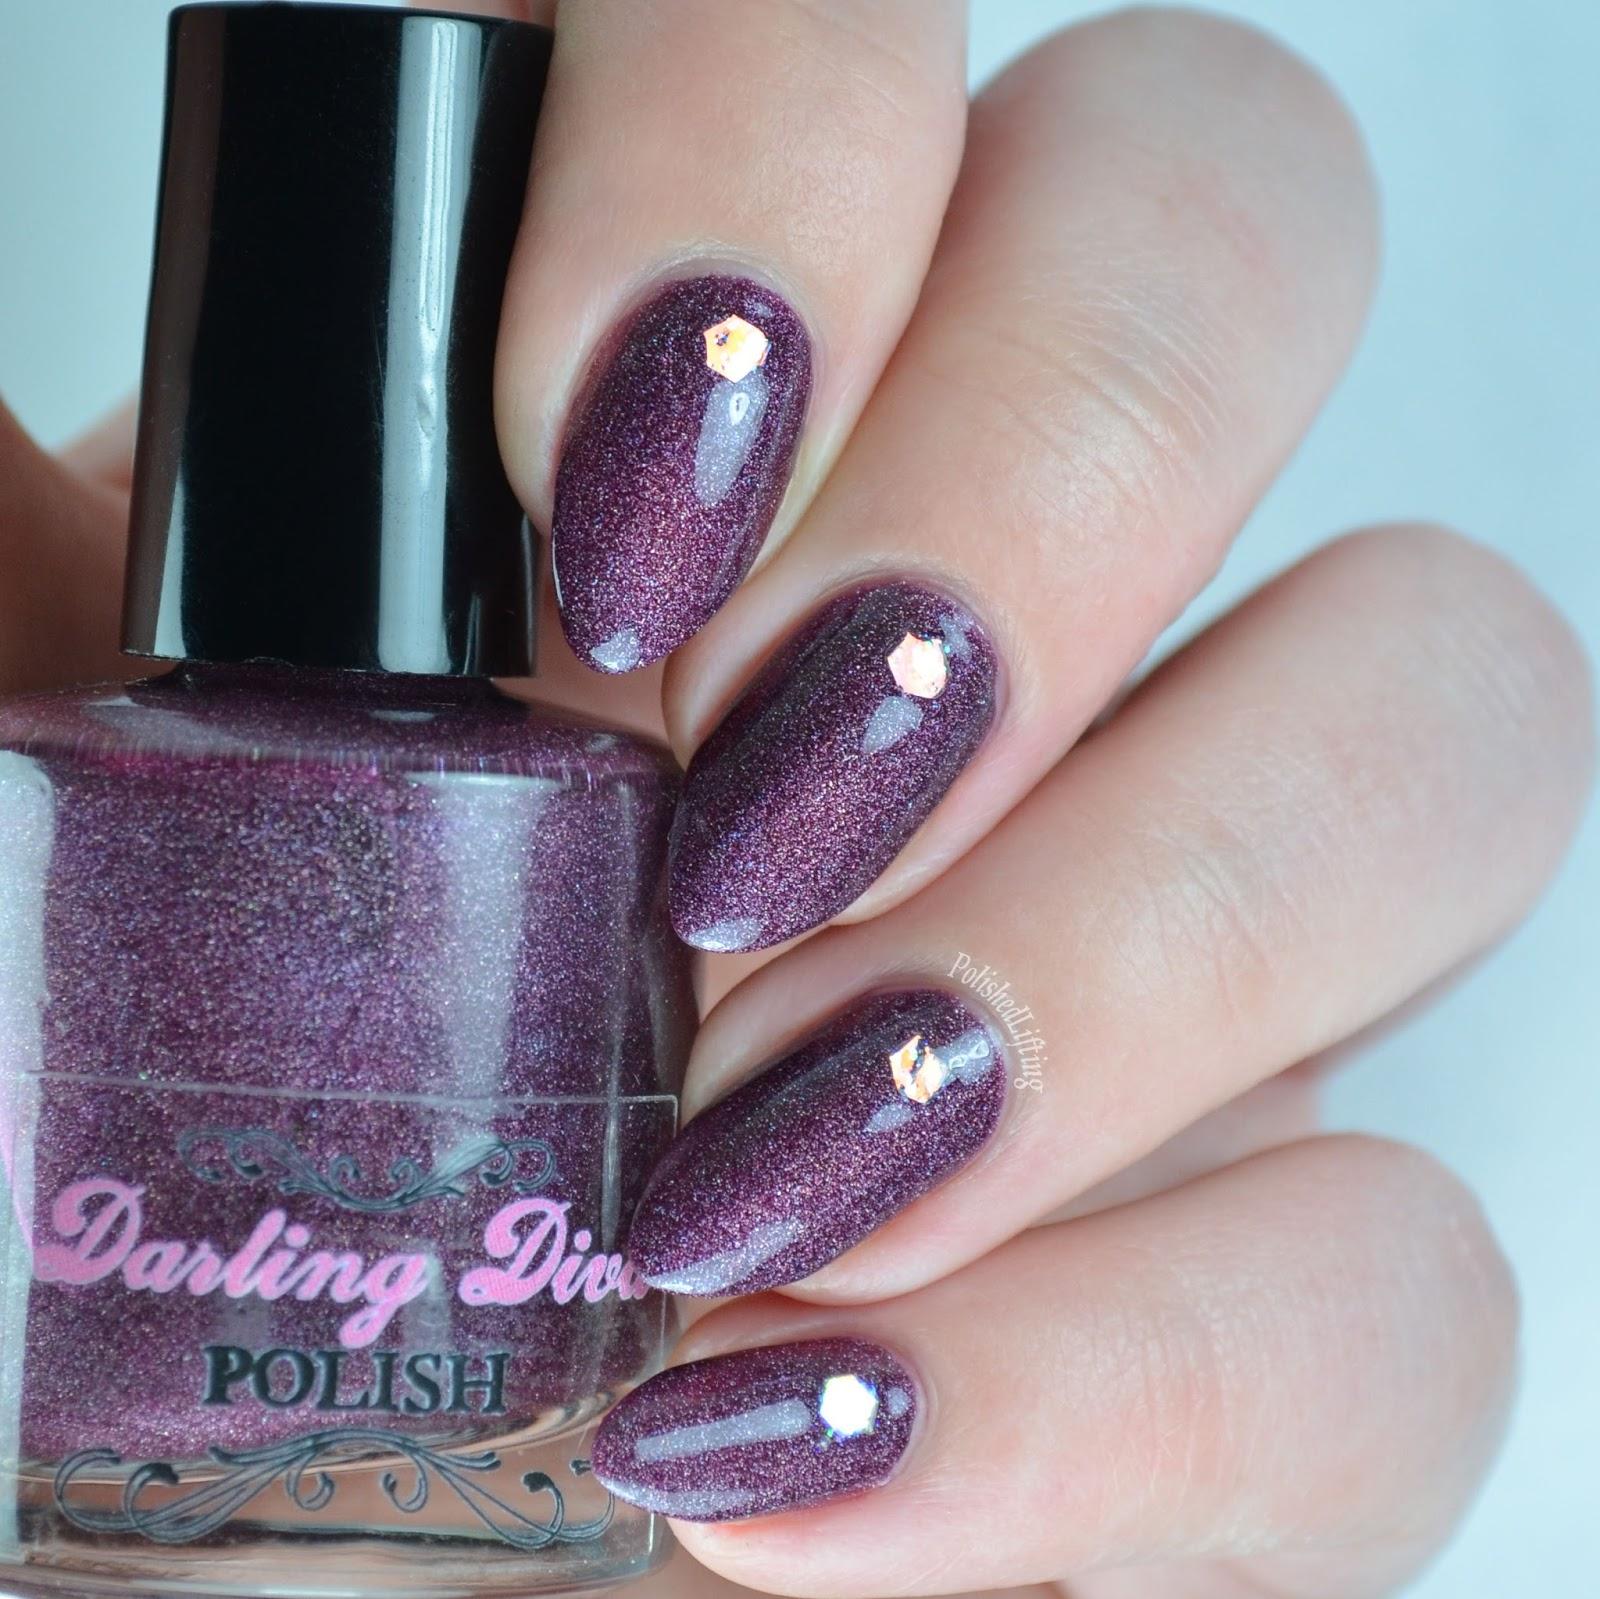 Polished Lifting: Darling Diva Polish Moar Wine Nao and You Killed ...